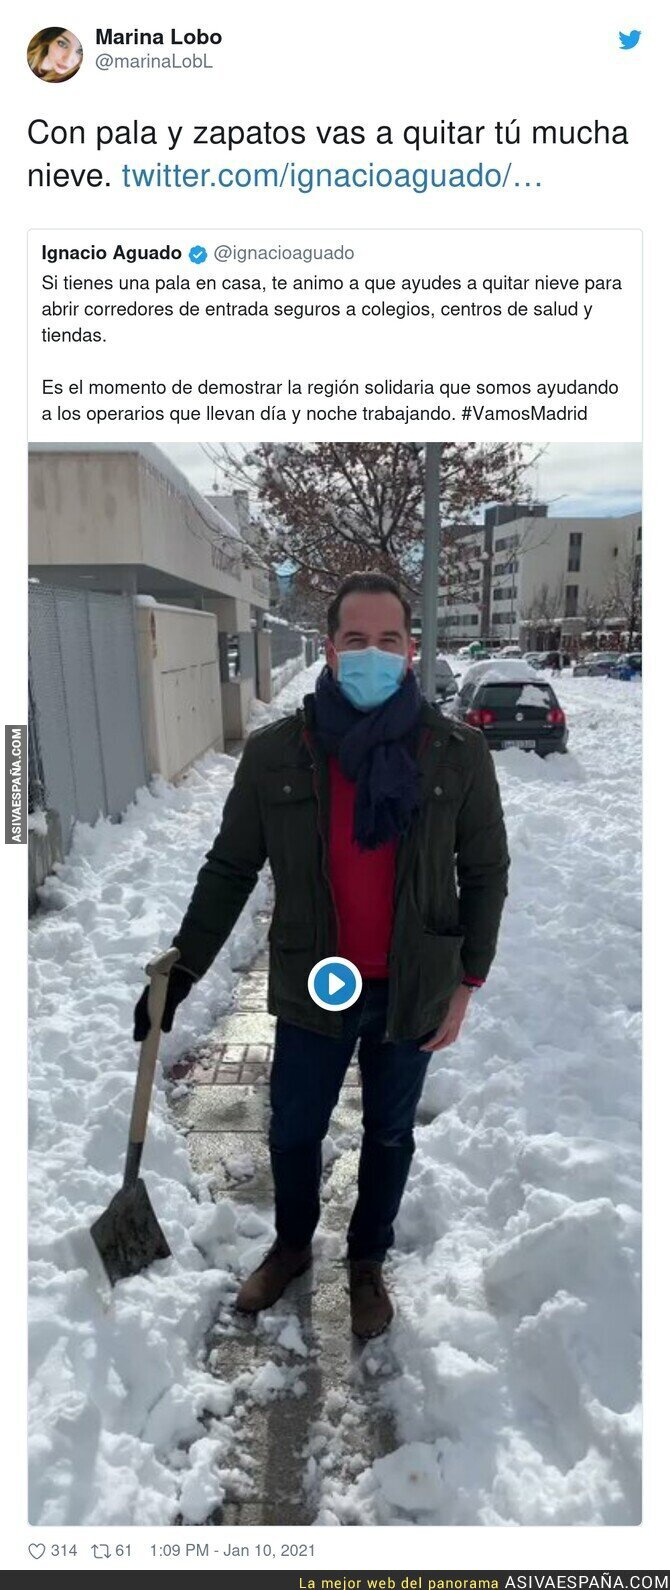 543975 - Menudo teatro para recoger nieve